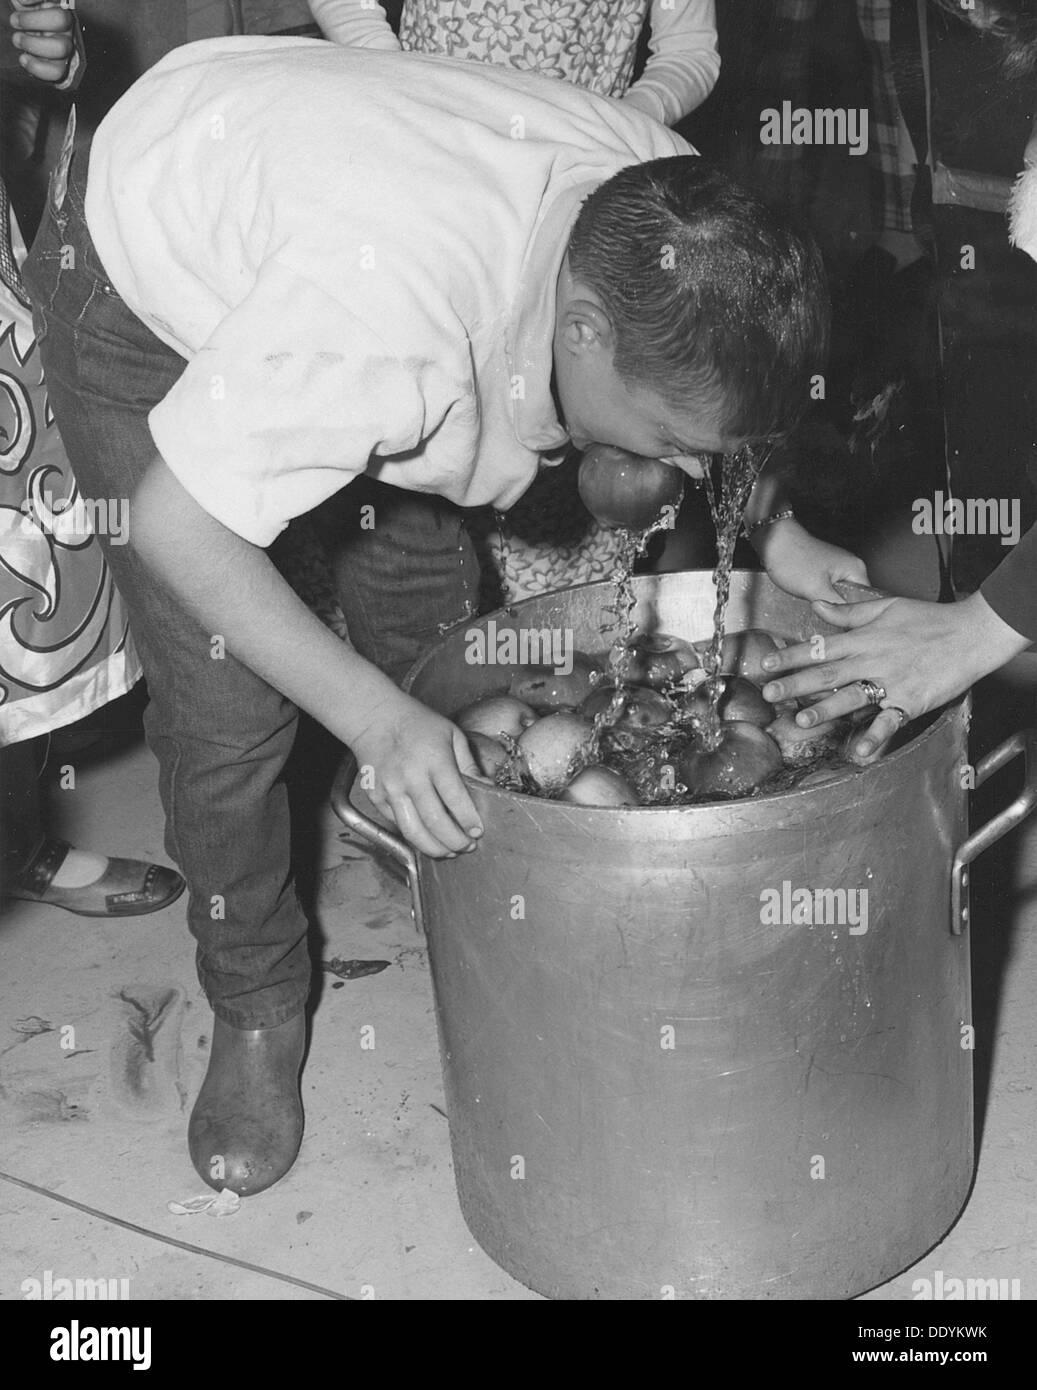 Célébrations de l'Halloween, à Fort Sheridan, Illinois, USA, 1970. Artiste: SP5 Photo Stock